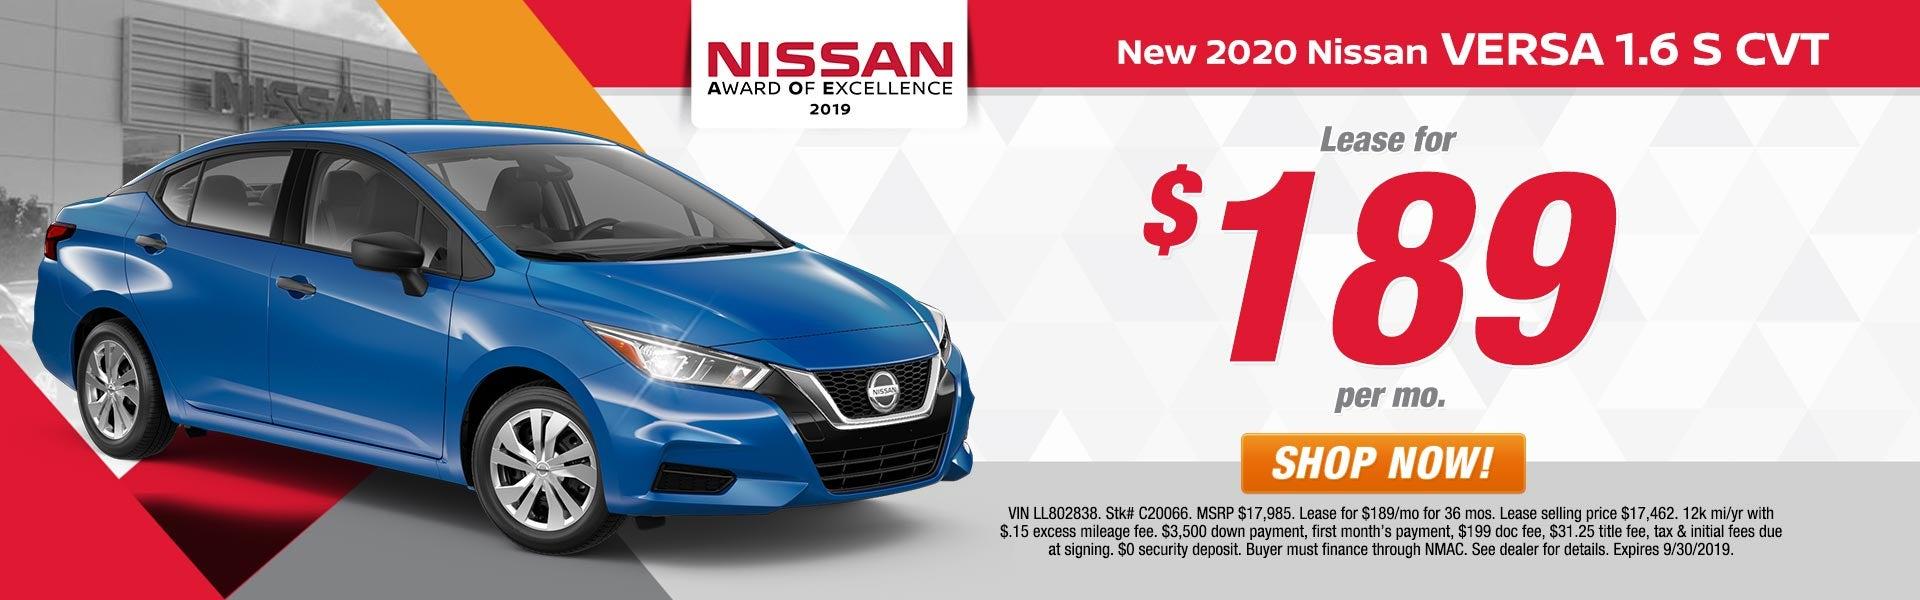 Andy Mohr Nissan Avon >> New Used Nissan Dealer Avon In Andy Mohr Avon Nissan